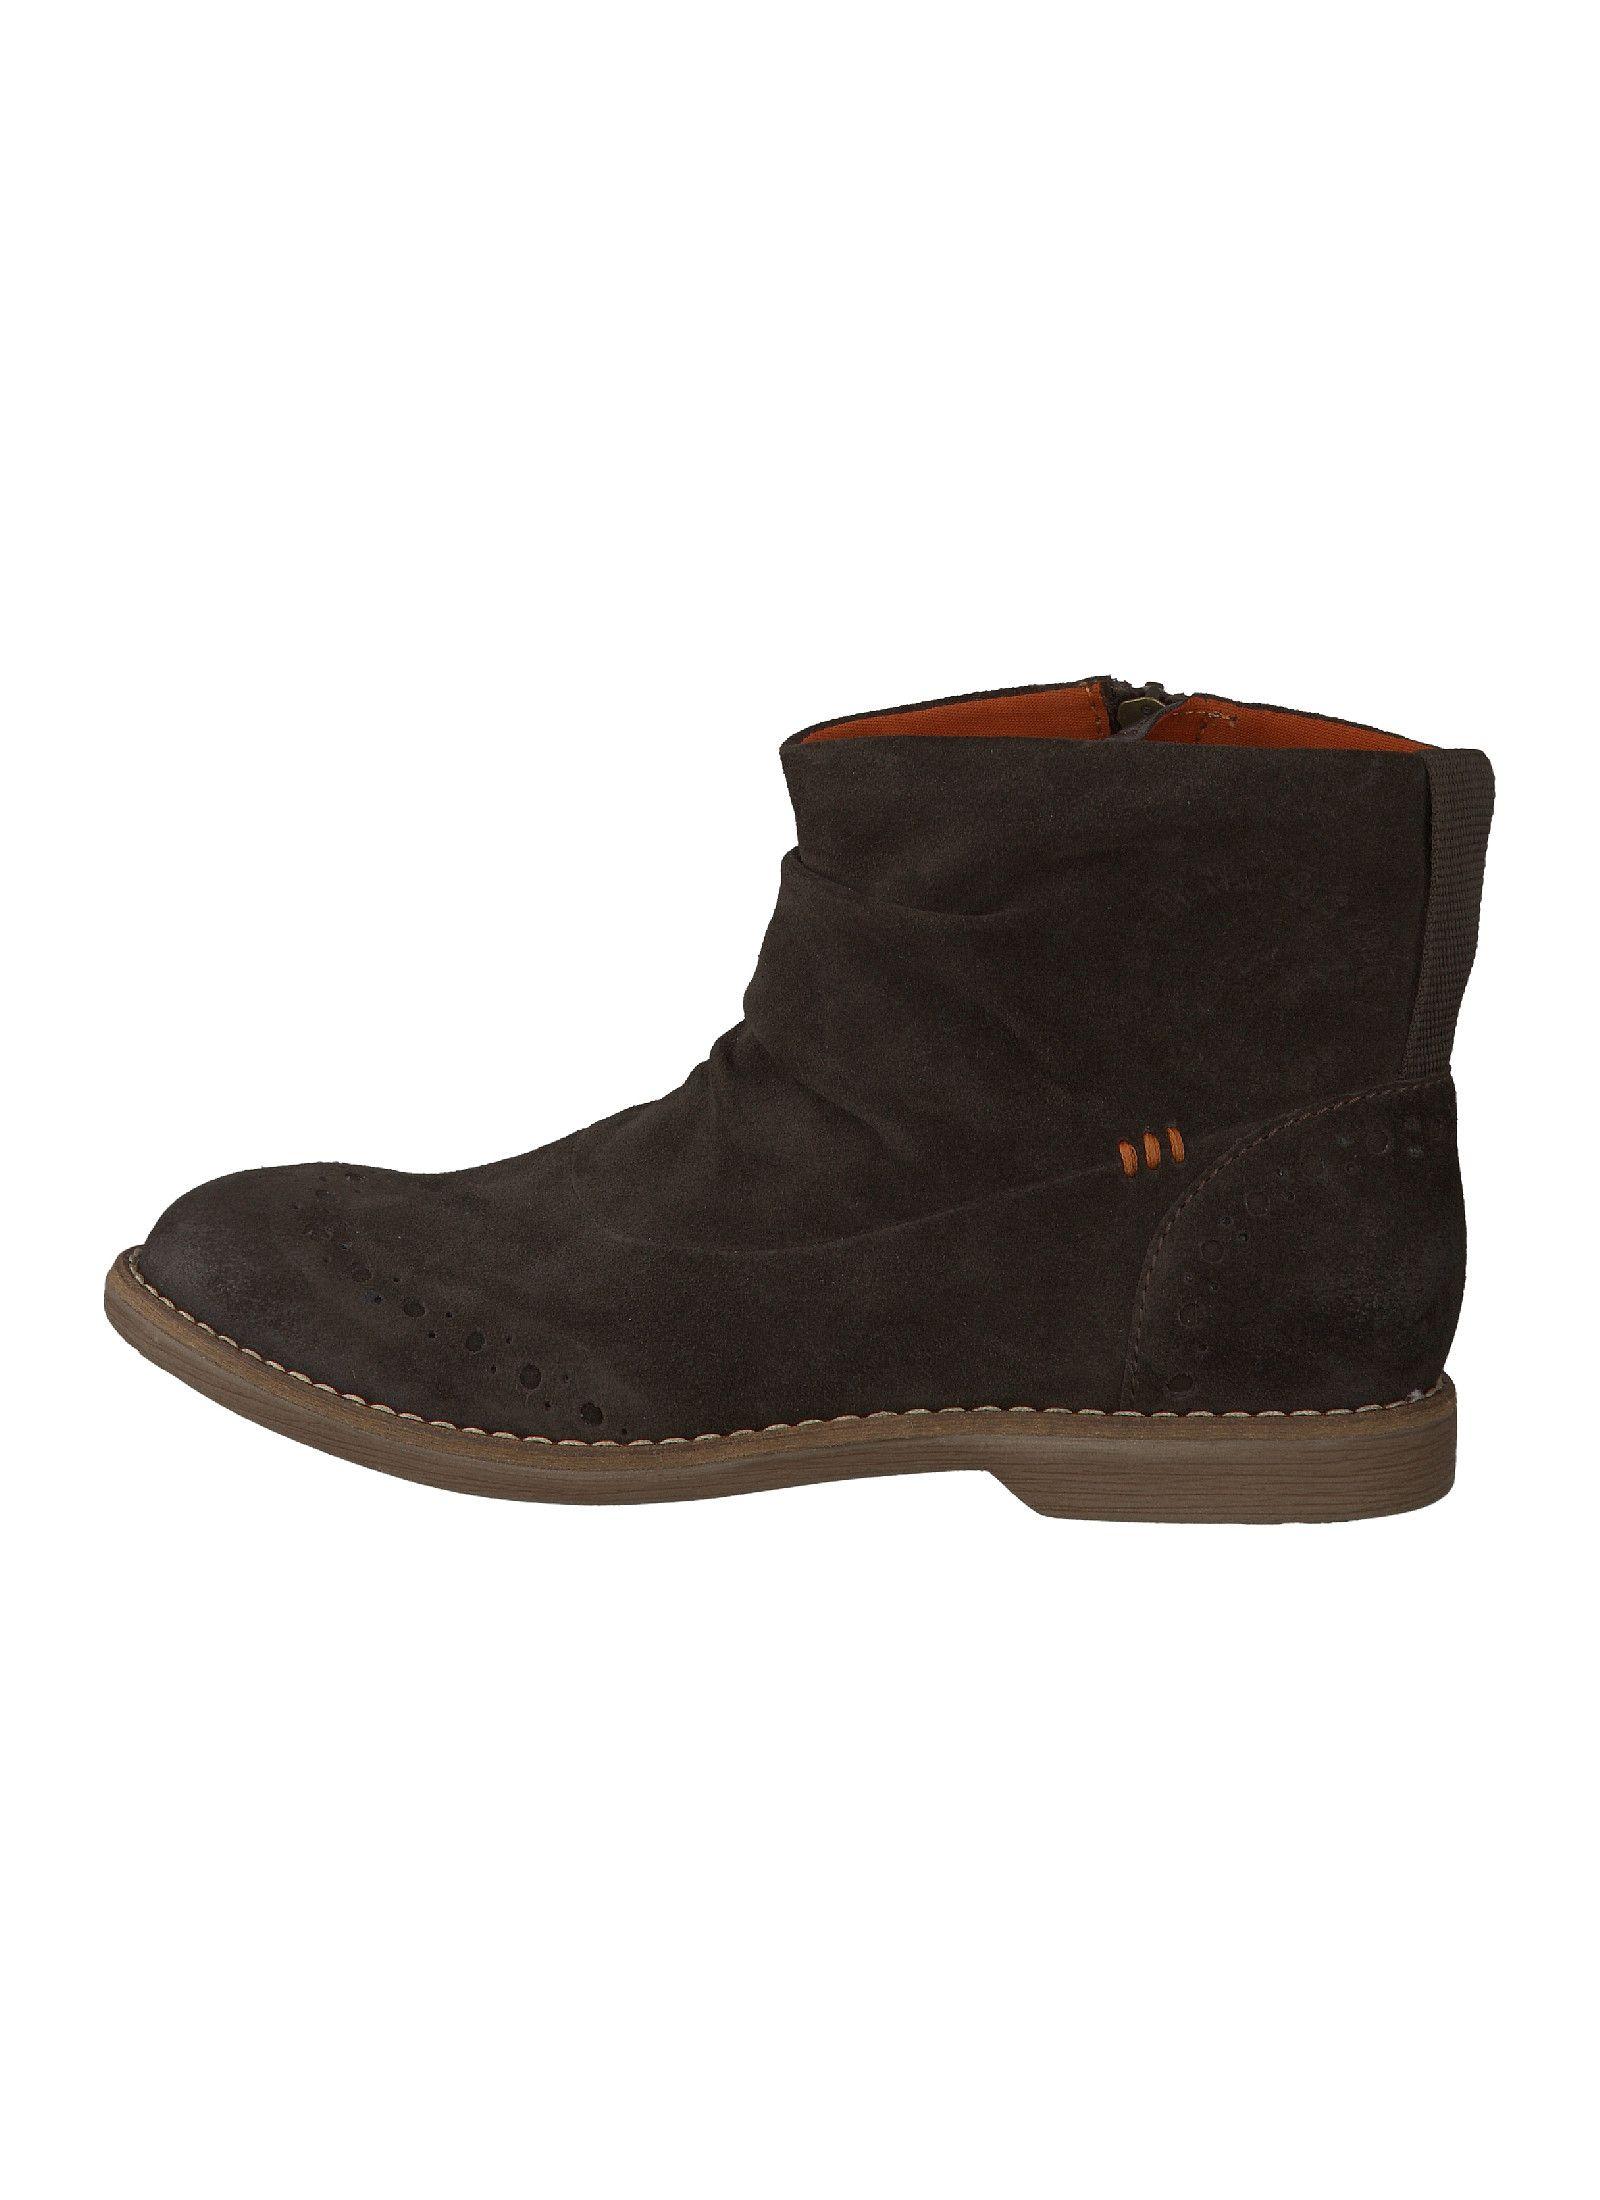 Reno S Oliver Stiefelette Dunkelbraun Stiefeletten Damen Schuhe Reno Online Shop Fur Marken Schuhe Chukka Boots Chelsea Boots Ankle Boot